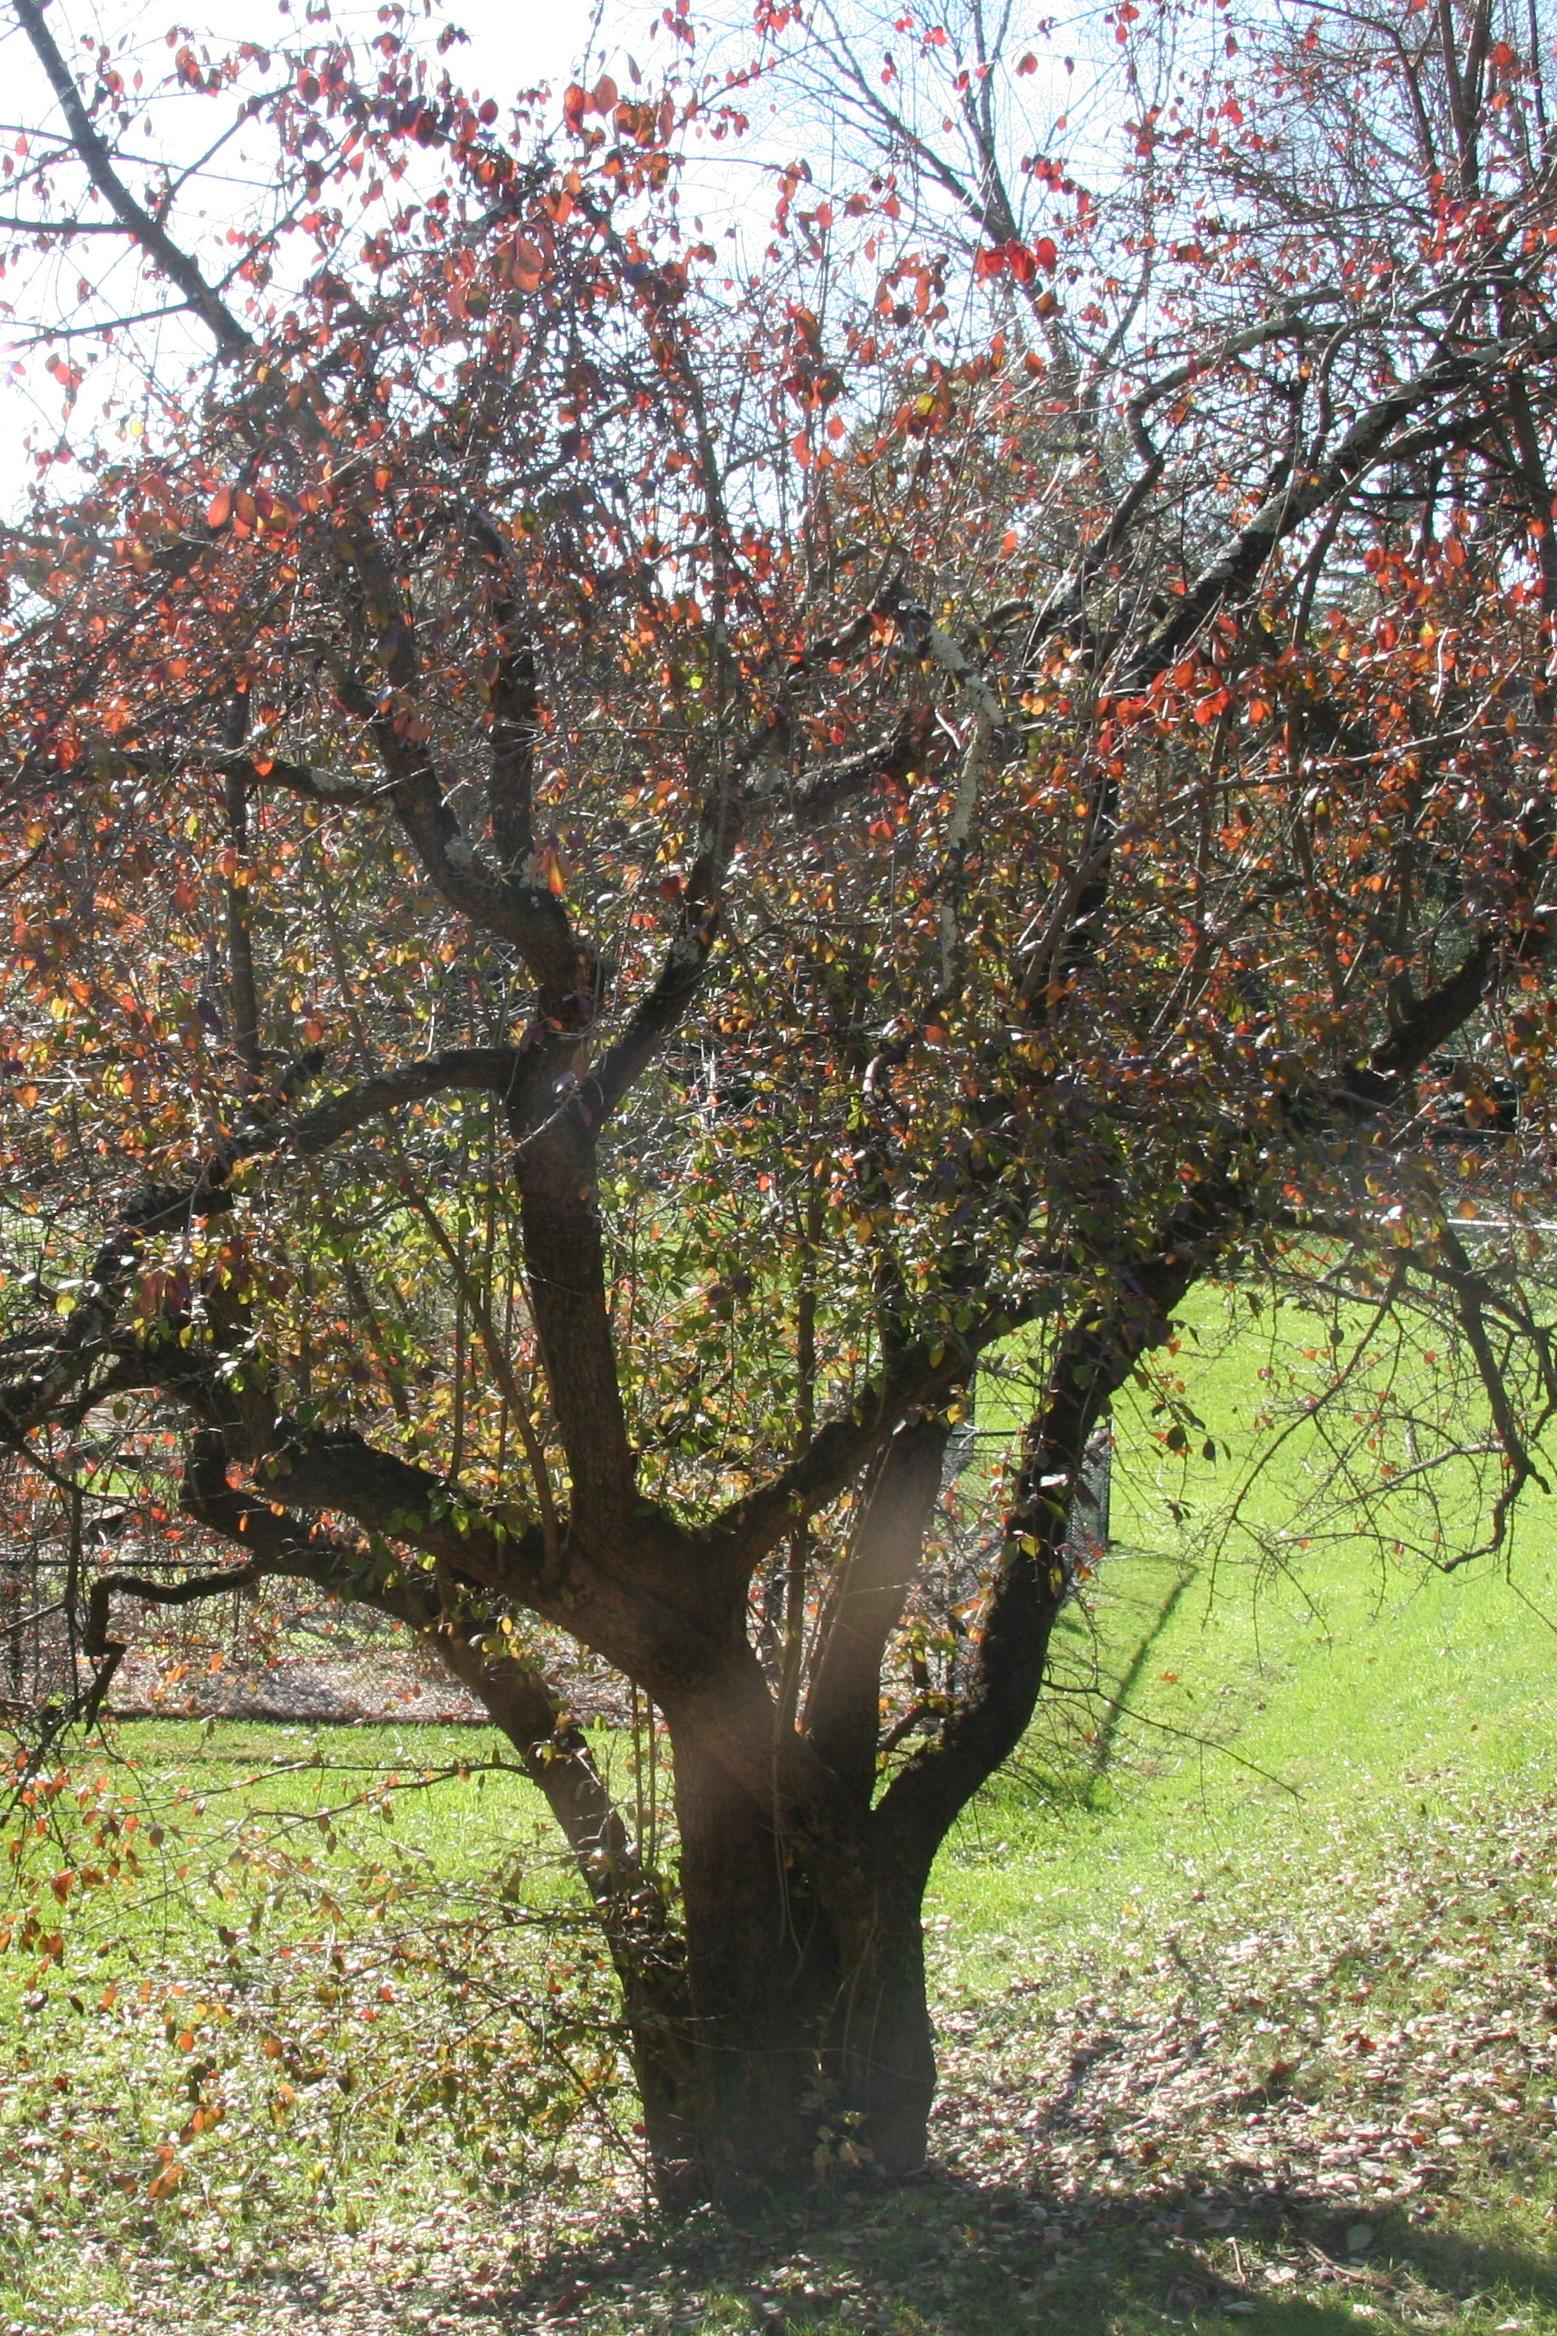 Blackhaw Viburnum Delaware Trees